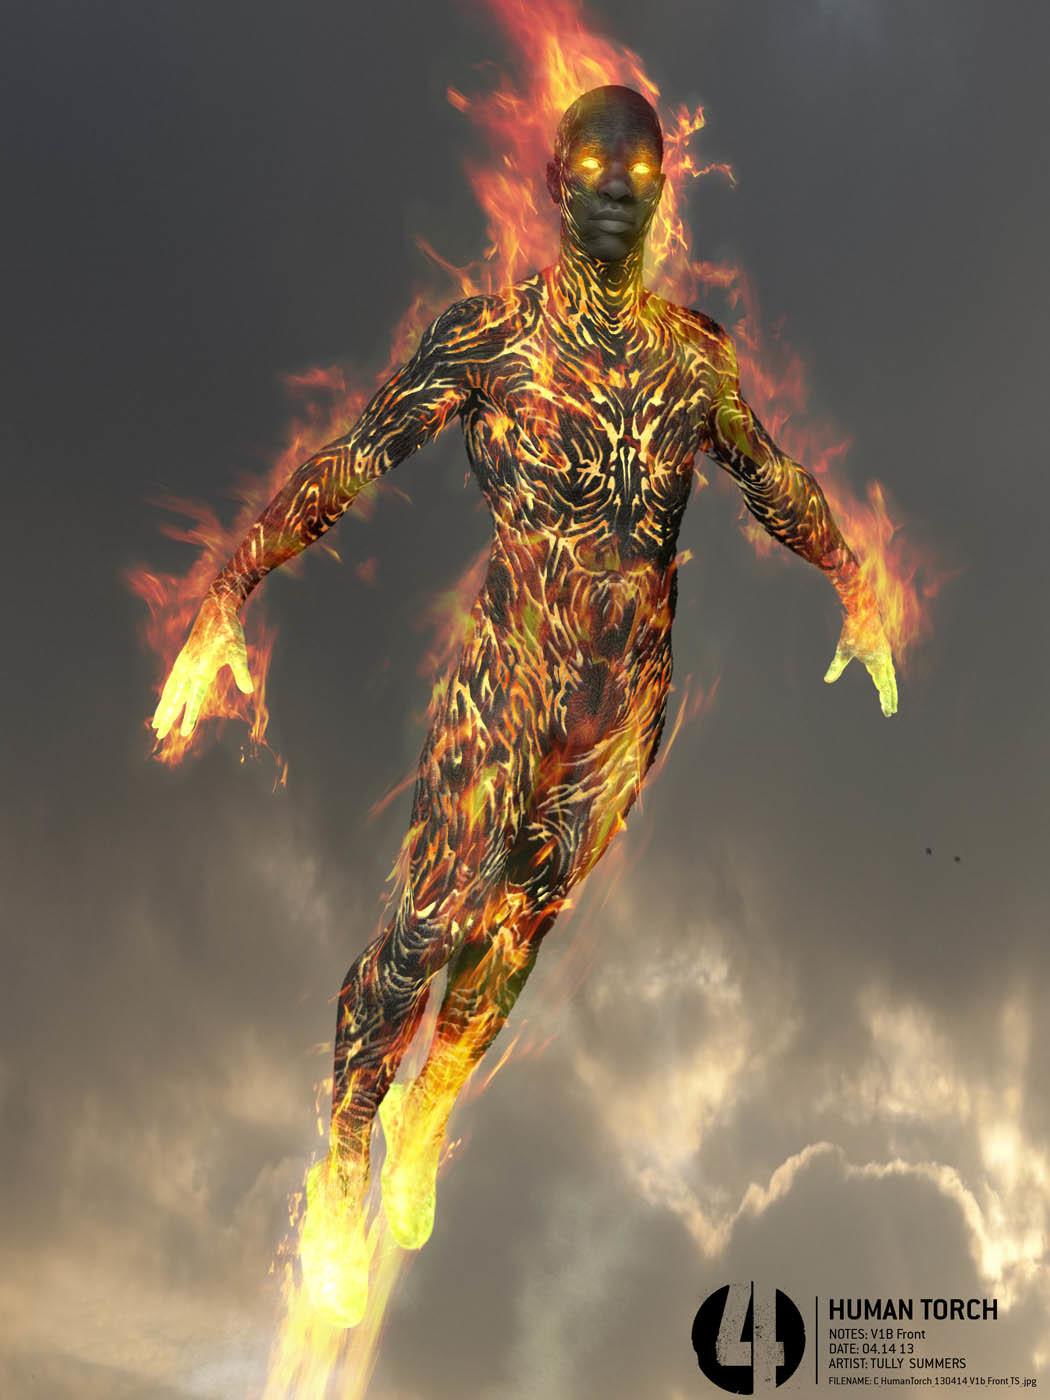 FANTASTIC FOUR (2015) Concept Art Reveals Alternate Takes ... |Fantastic Four 2015 Human Torch